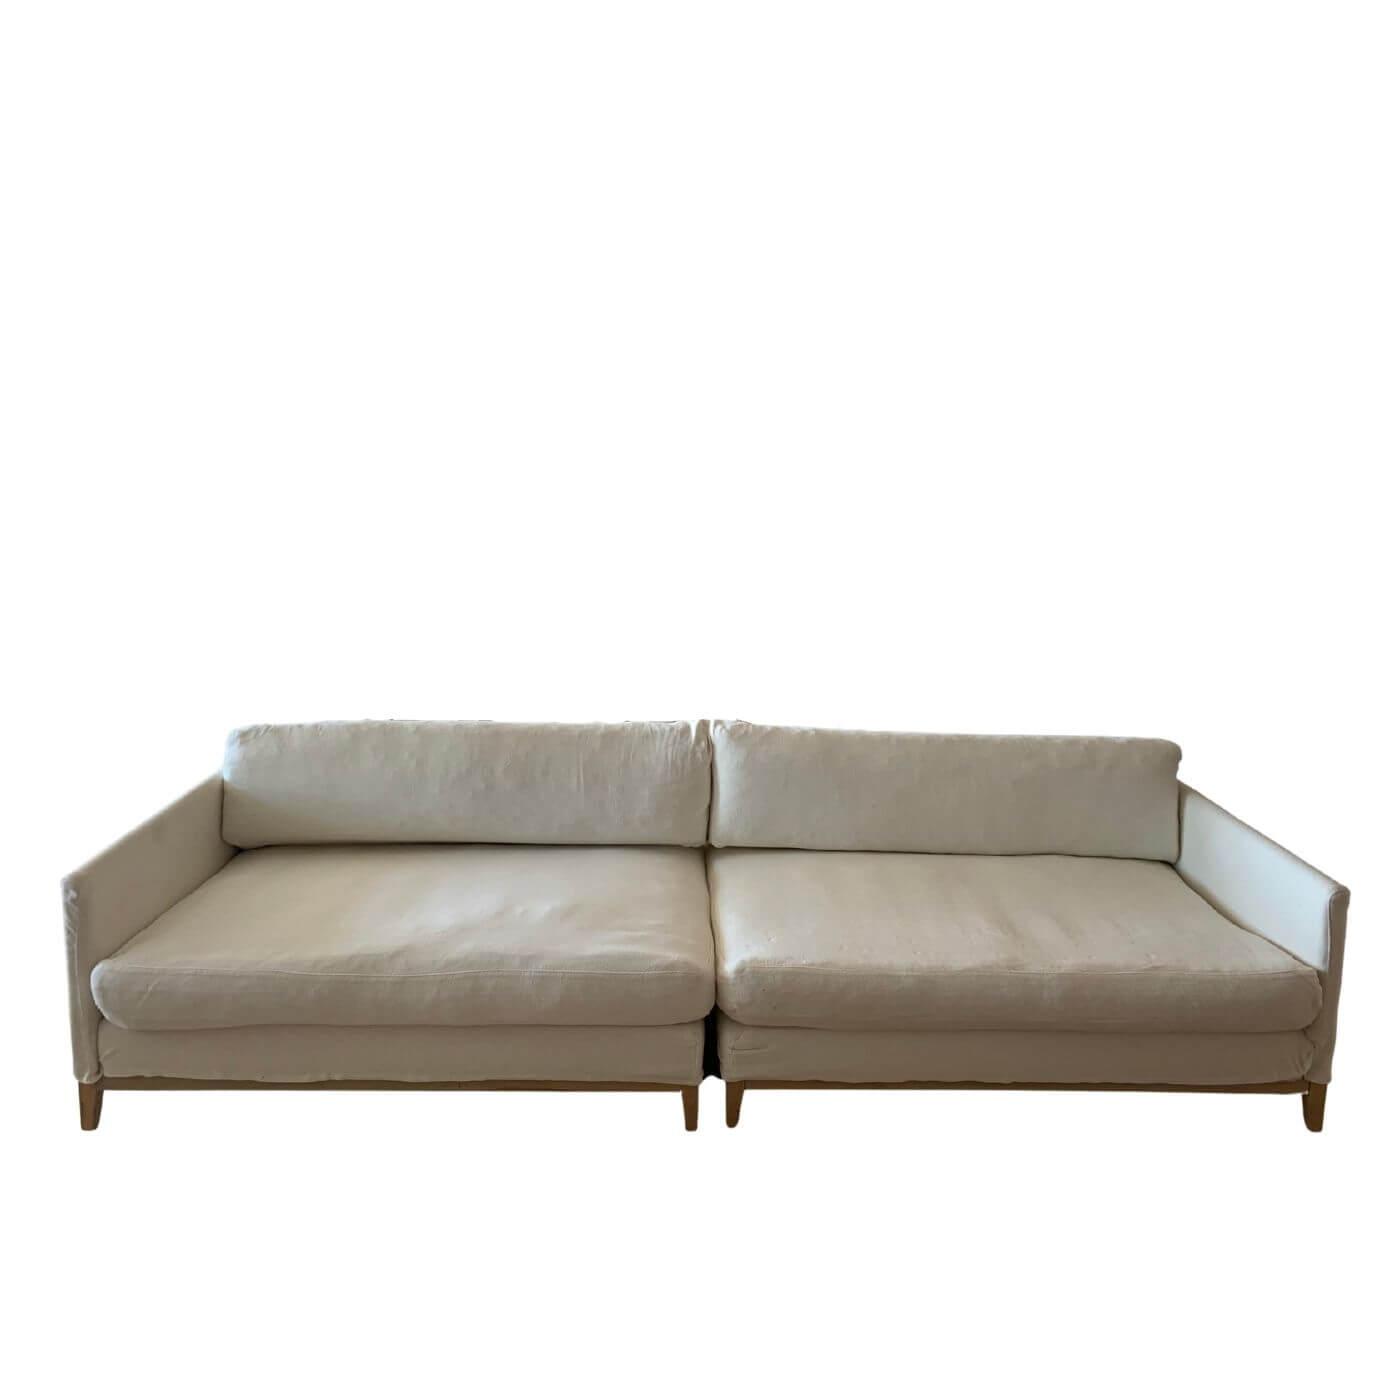 MCM House Banjo sofa